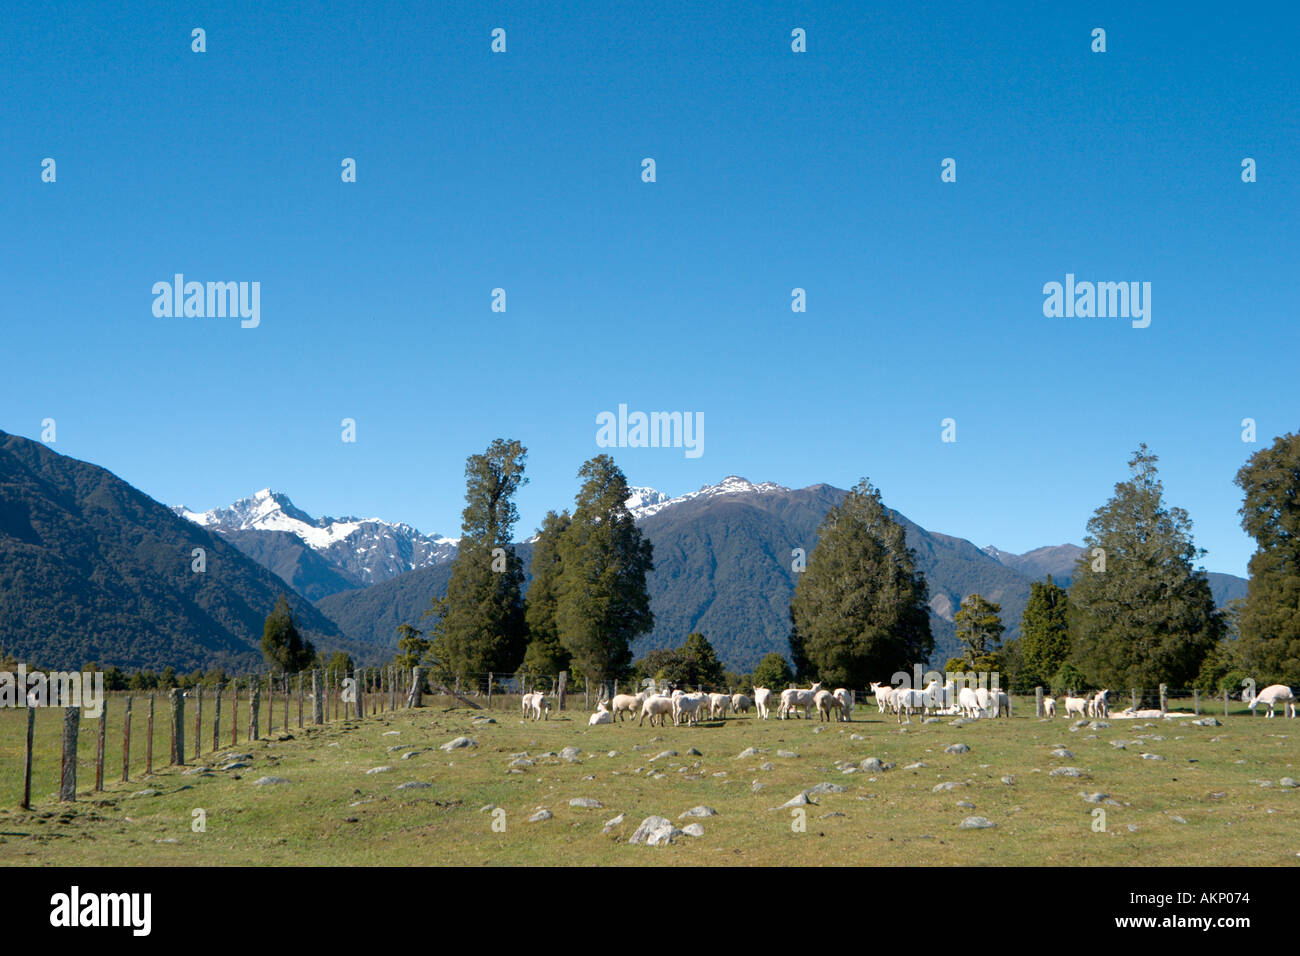 Sheep farm near Fox Glacier, South Island, New Zealand - Stock Image